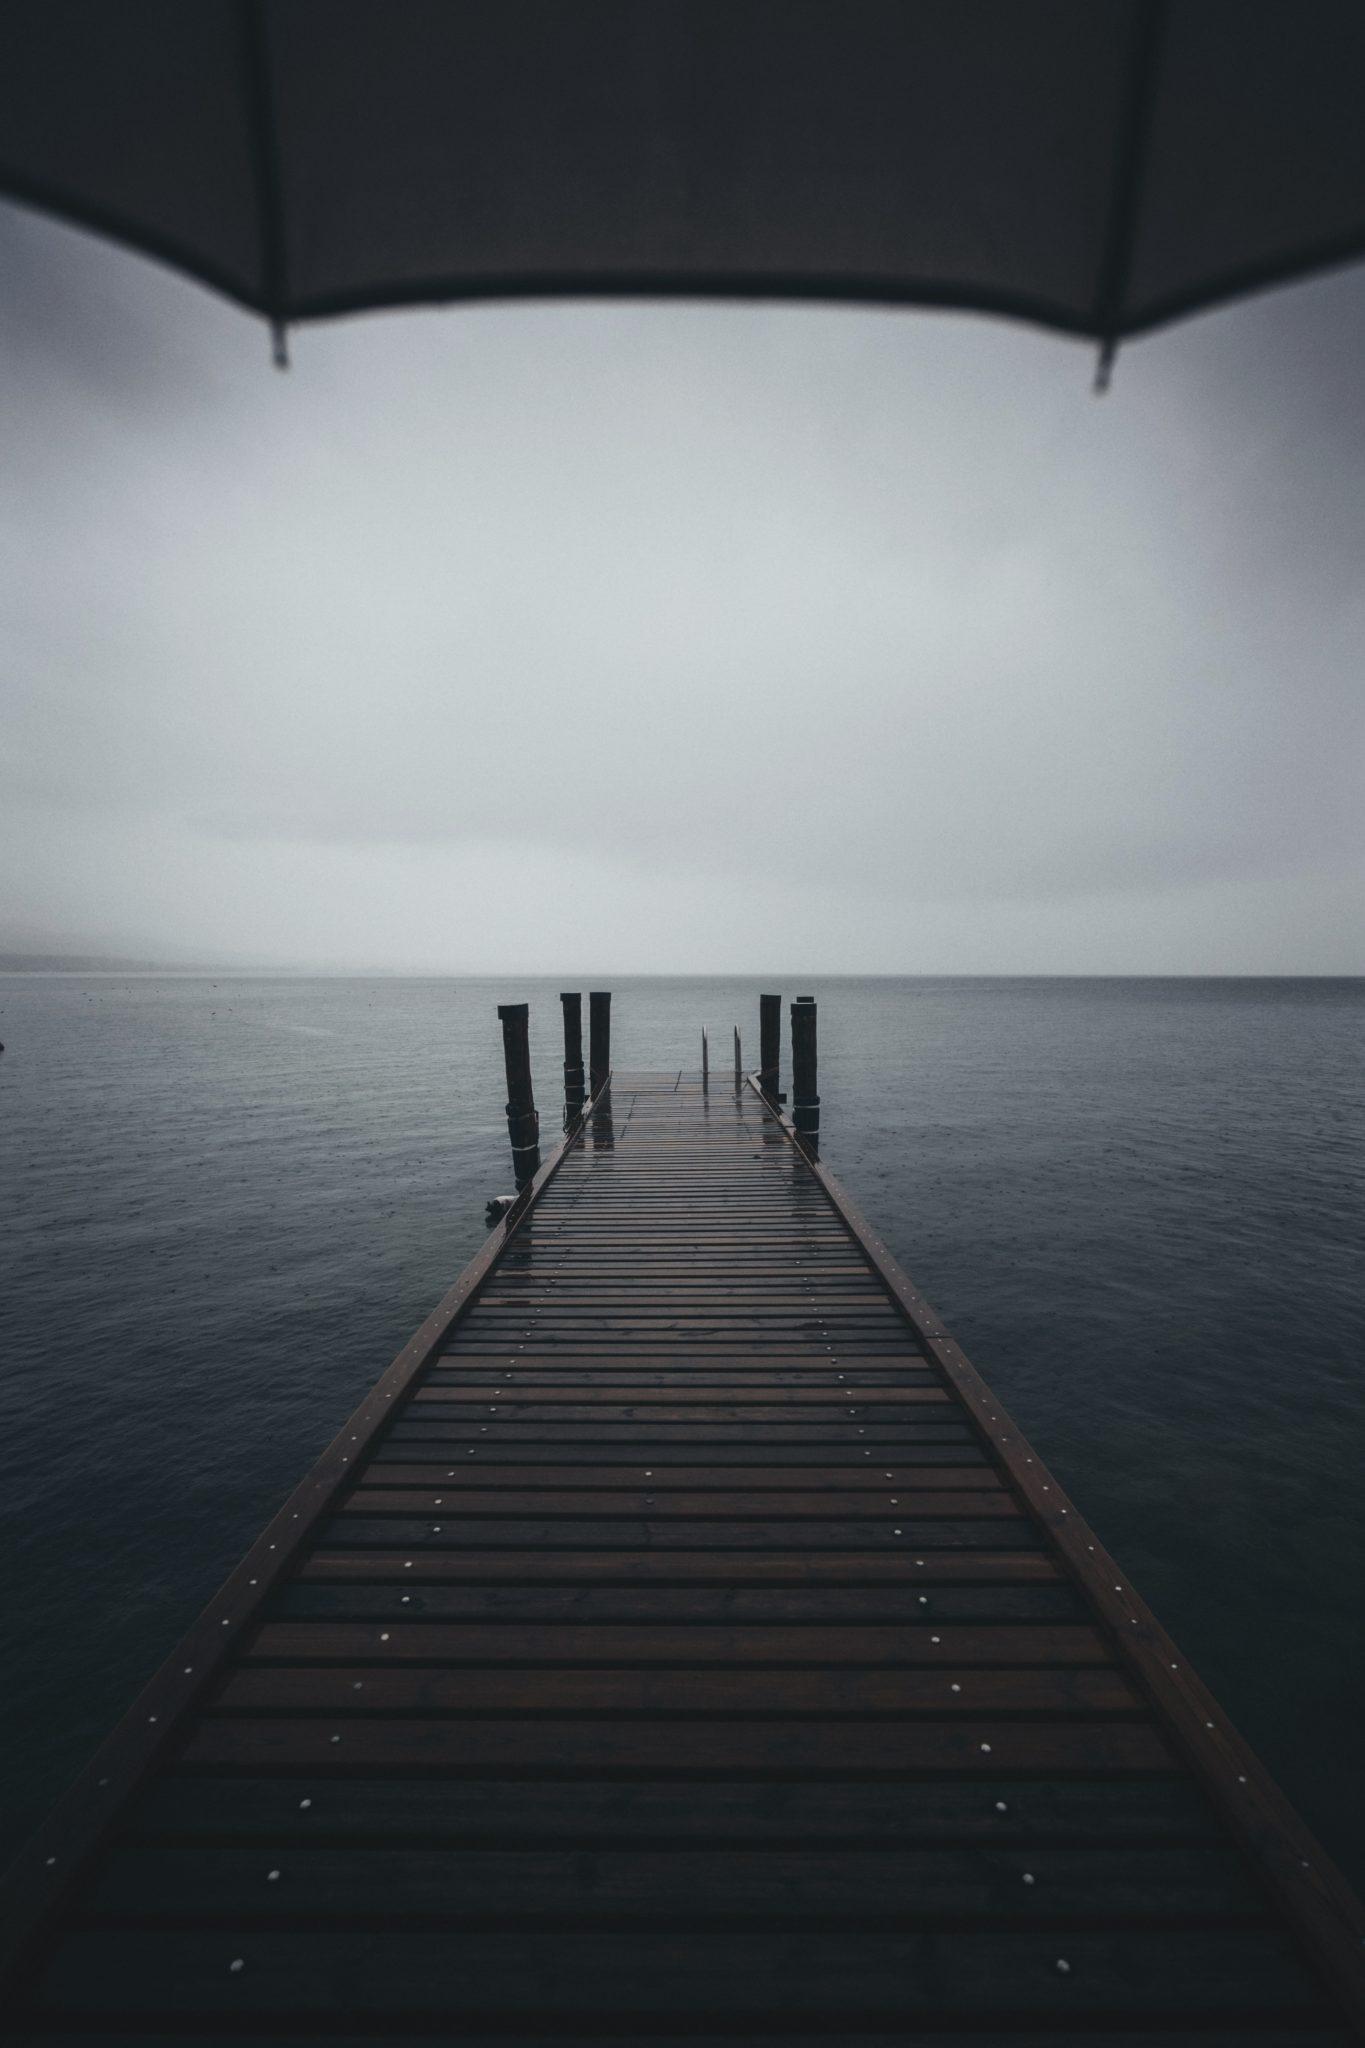 Burnout, Depression